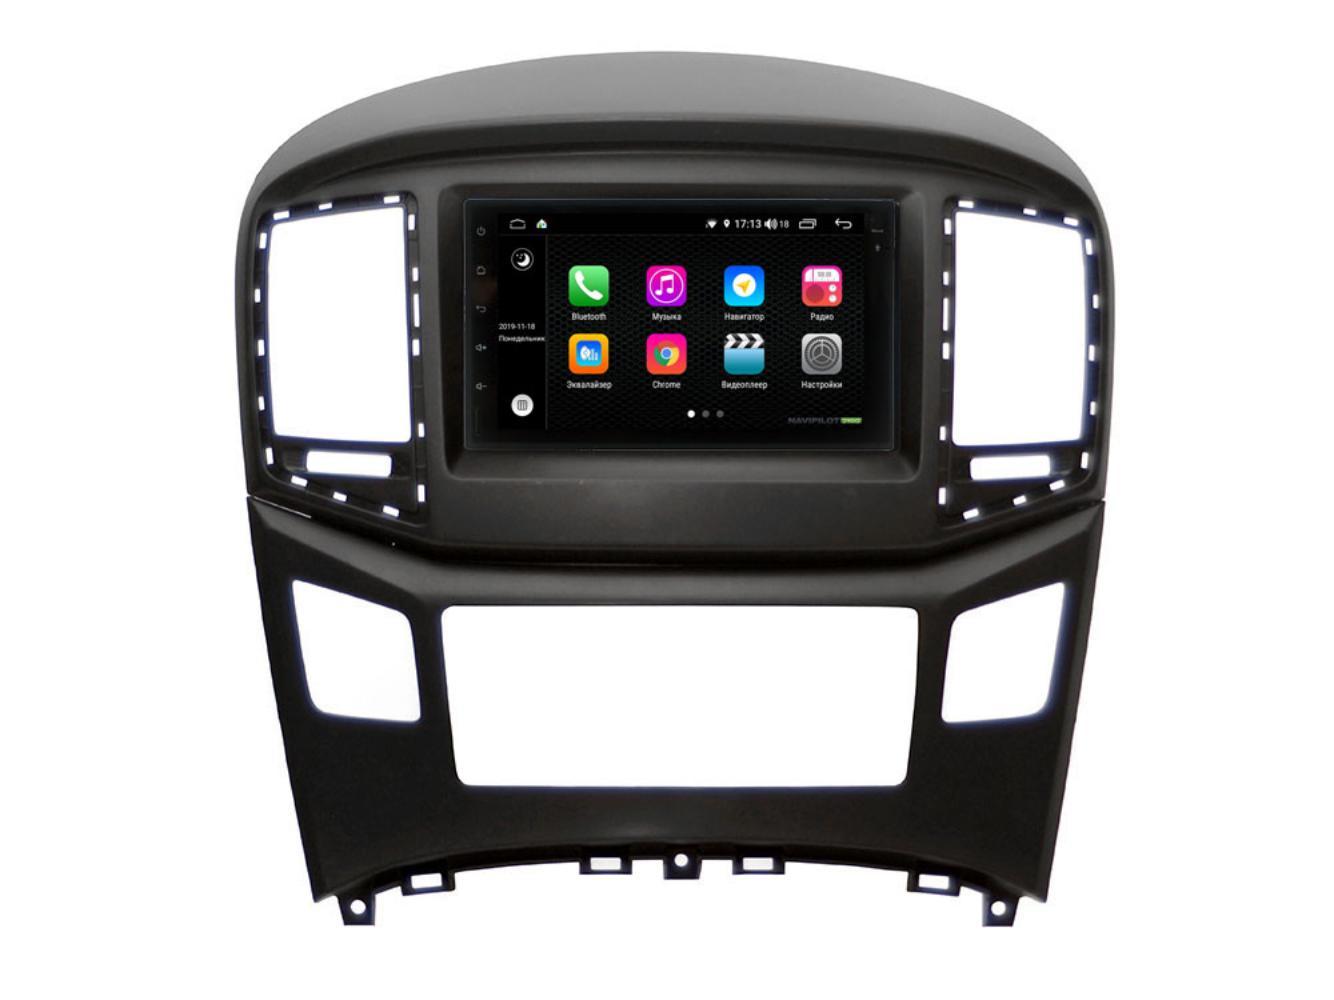 Автомагнитола NaviPilot DROID9L для Hyundai H1 - Grand Starex 2016 - н.в. FT (+ Камера заднего вида в подарок!)